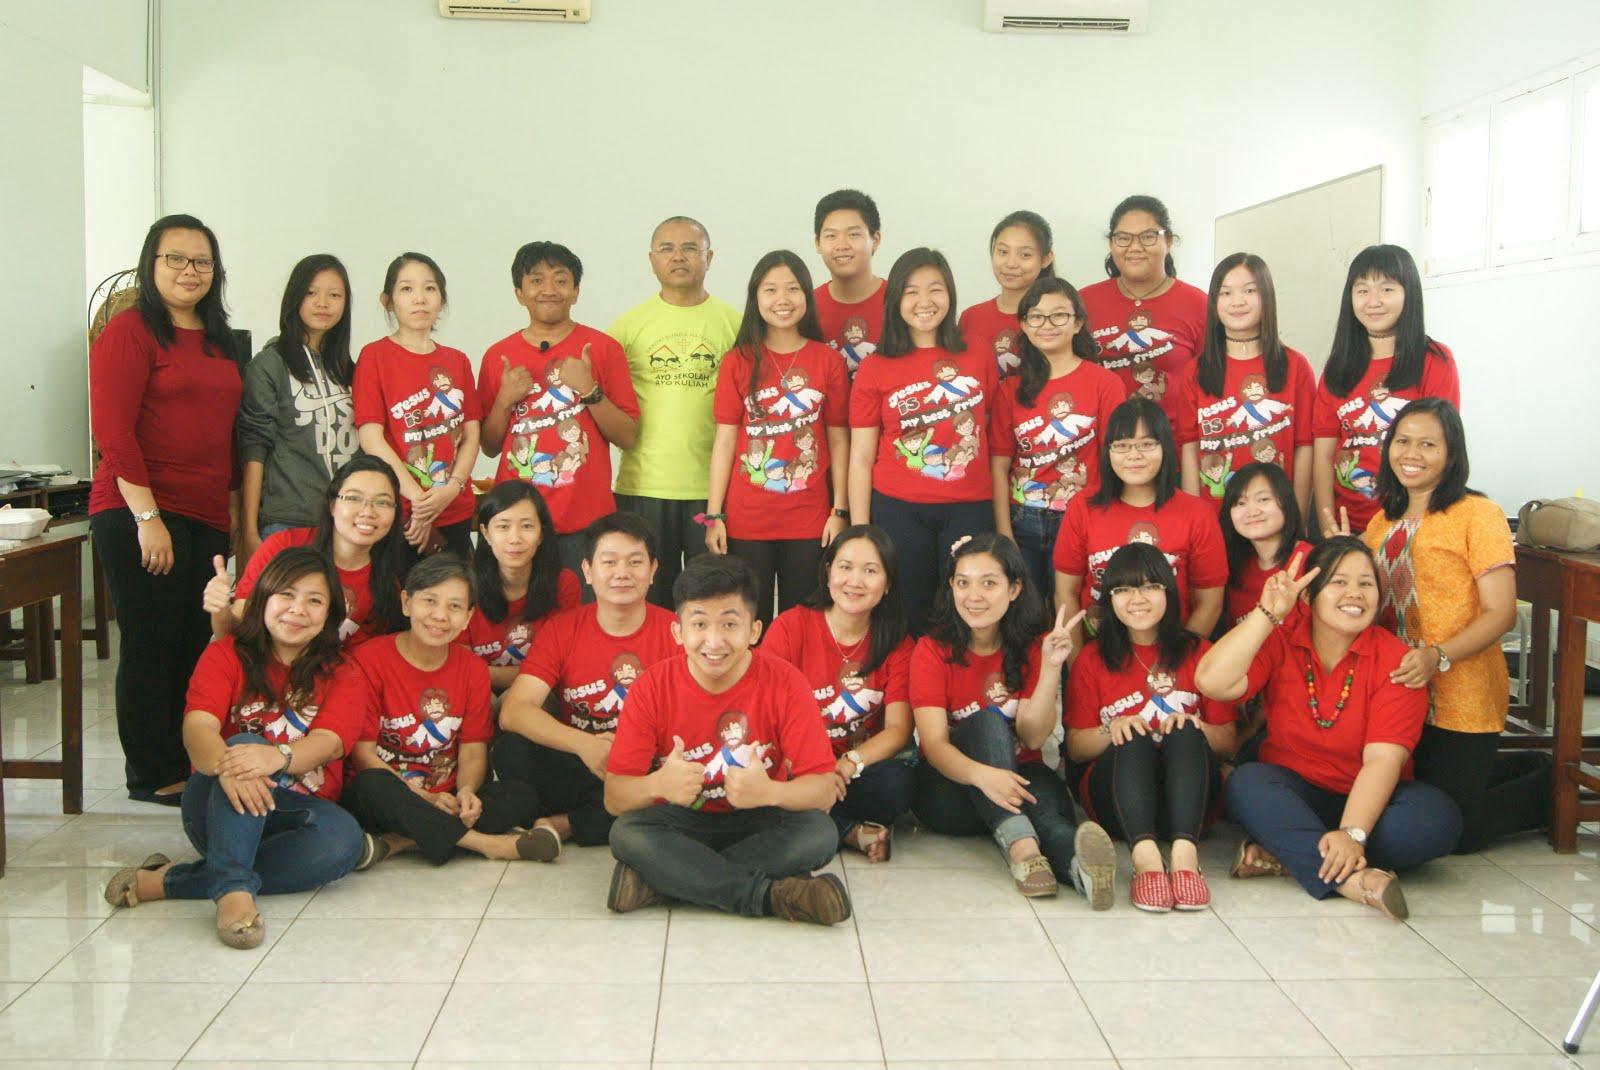 Bersama Pendamping BIA St.Anna paroki Bunda Hati Kudus Jakarta Pusat (10-11 Oktober 2015)